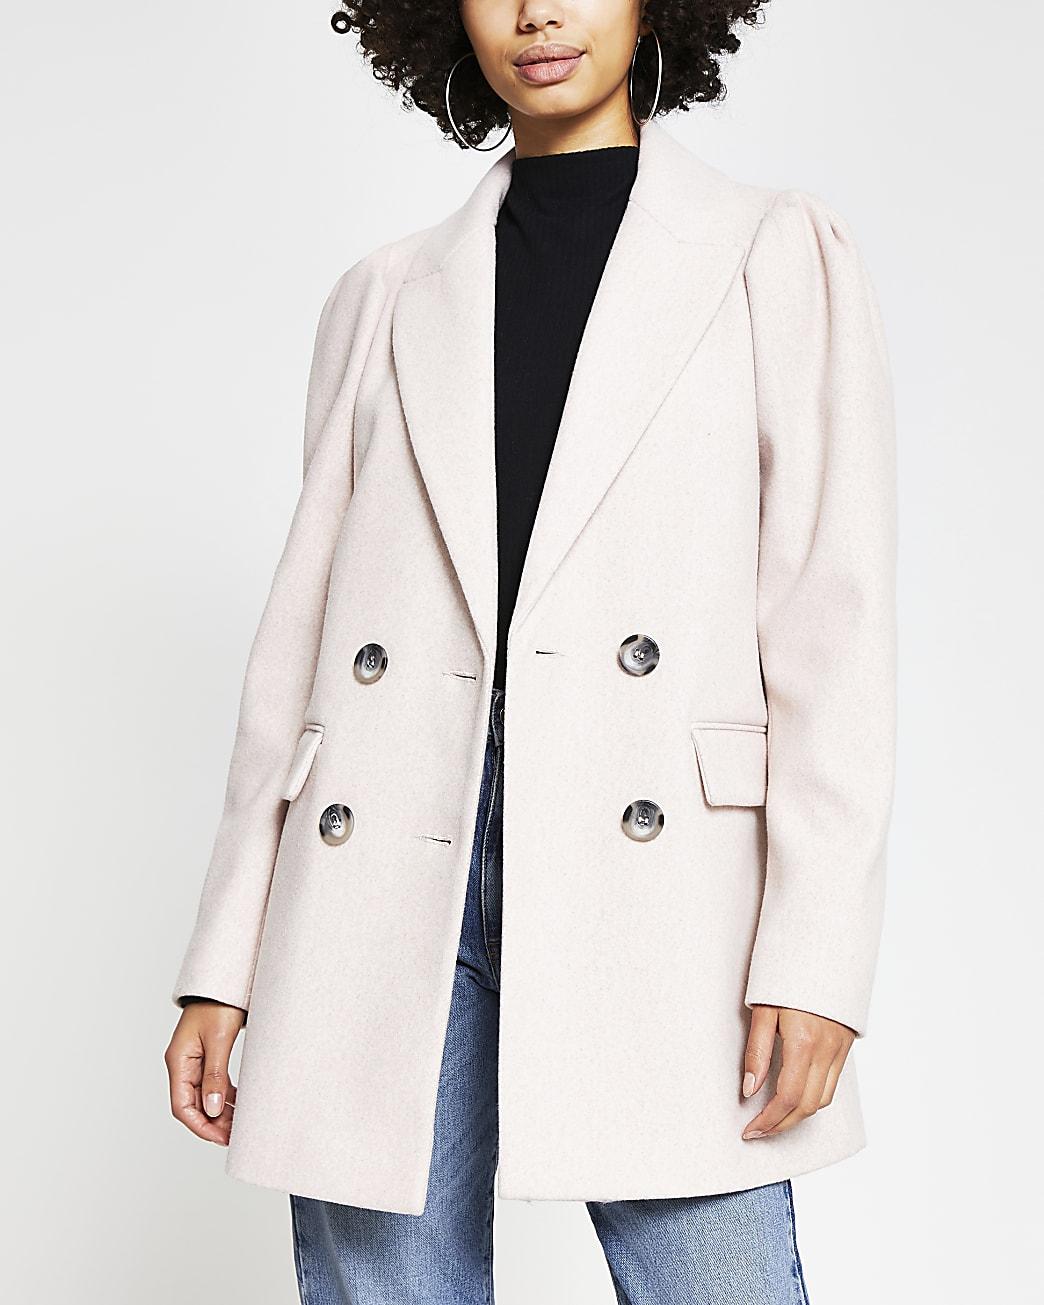 Pink puff sleeve blazer coat